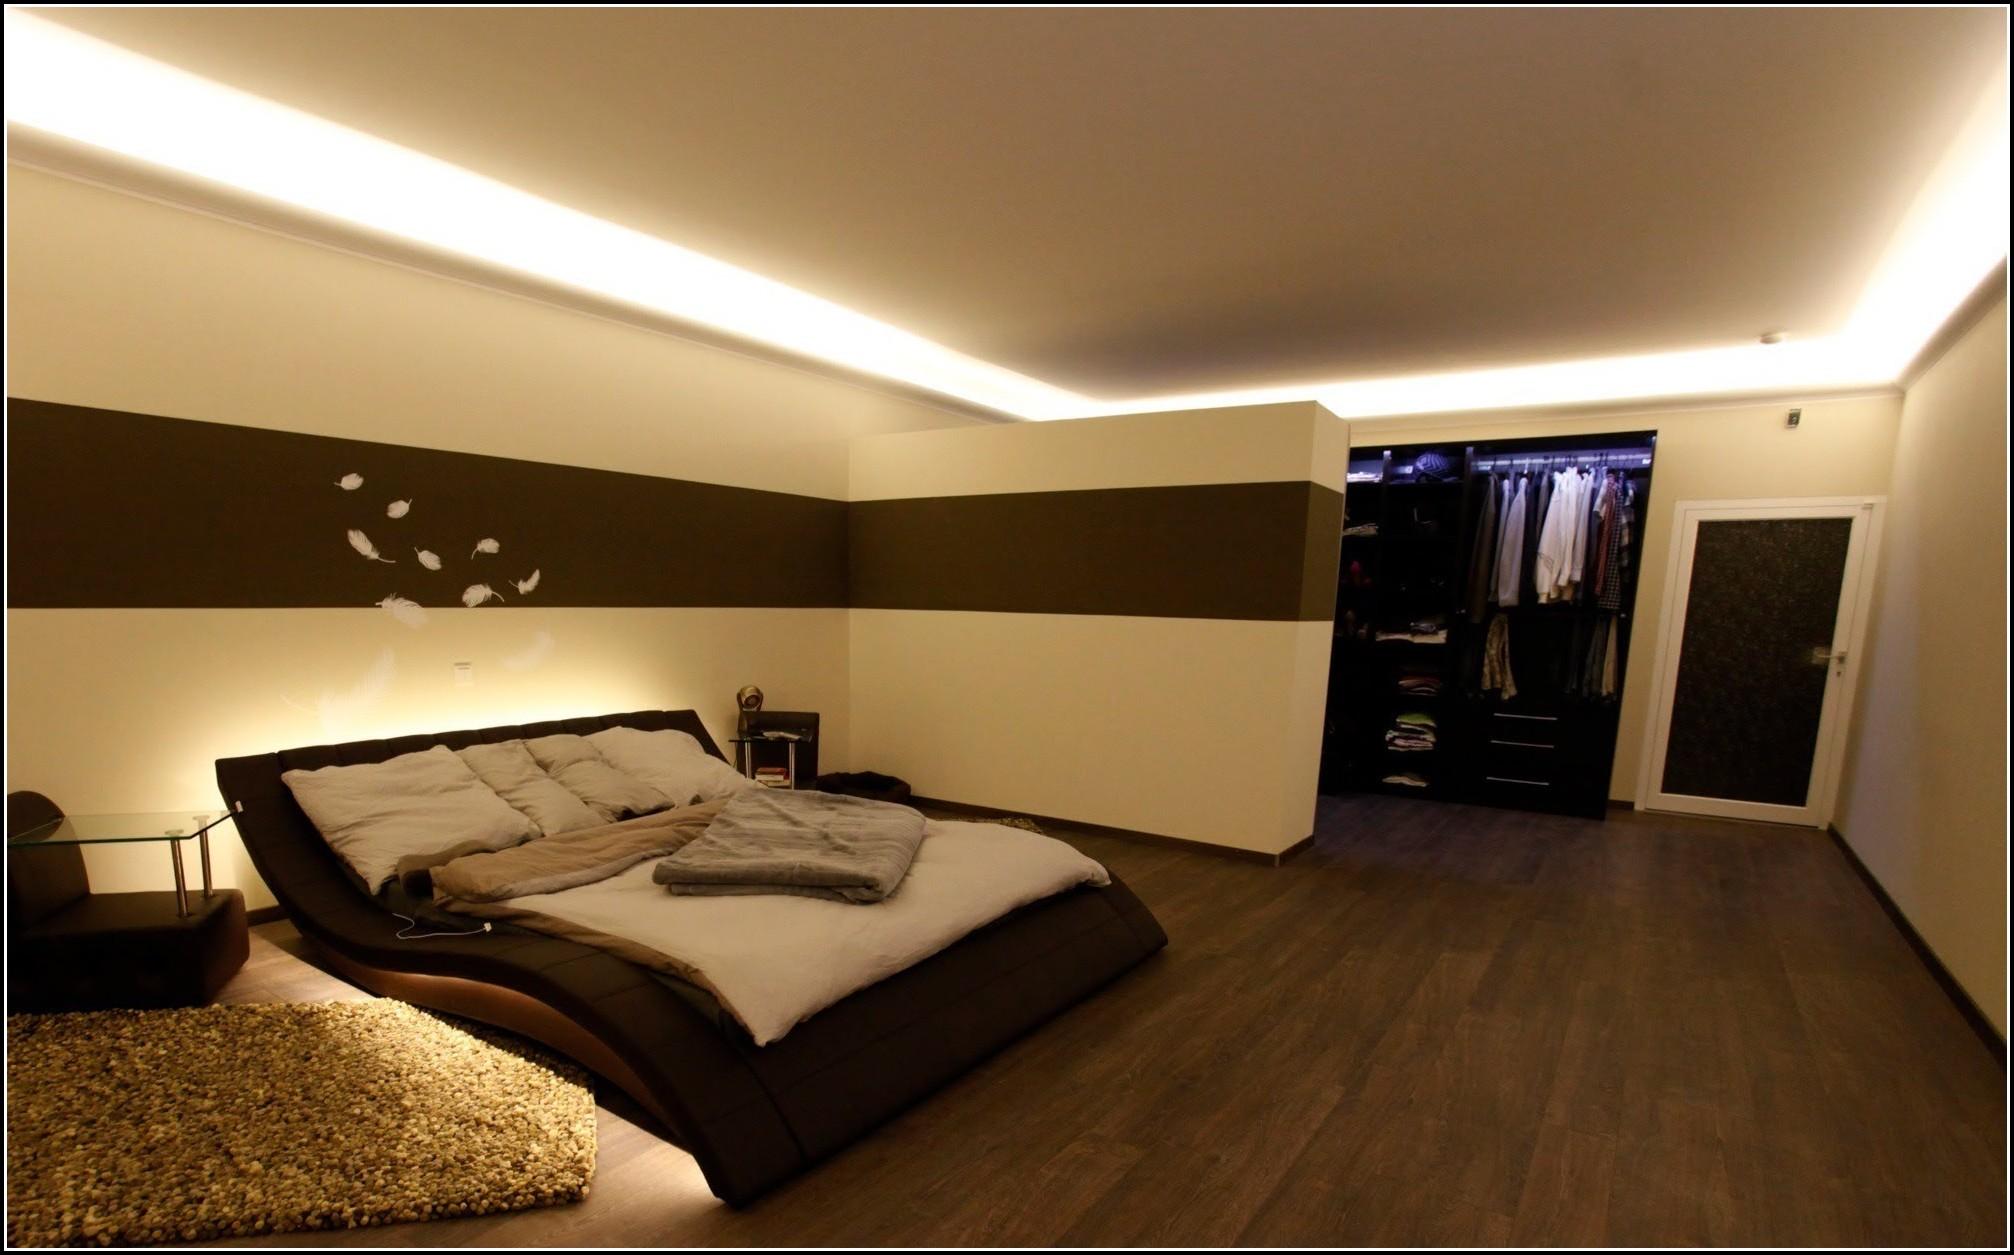 wohnzimmer mit led beleuchtung download page beste. Black Bedroom Furniture Sets. Home Design Ideas